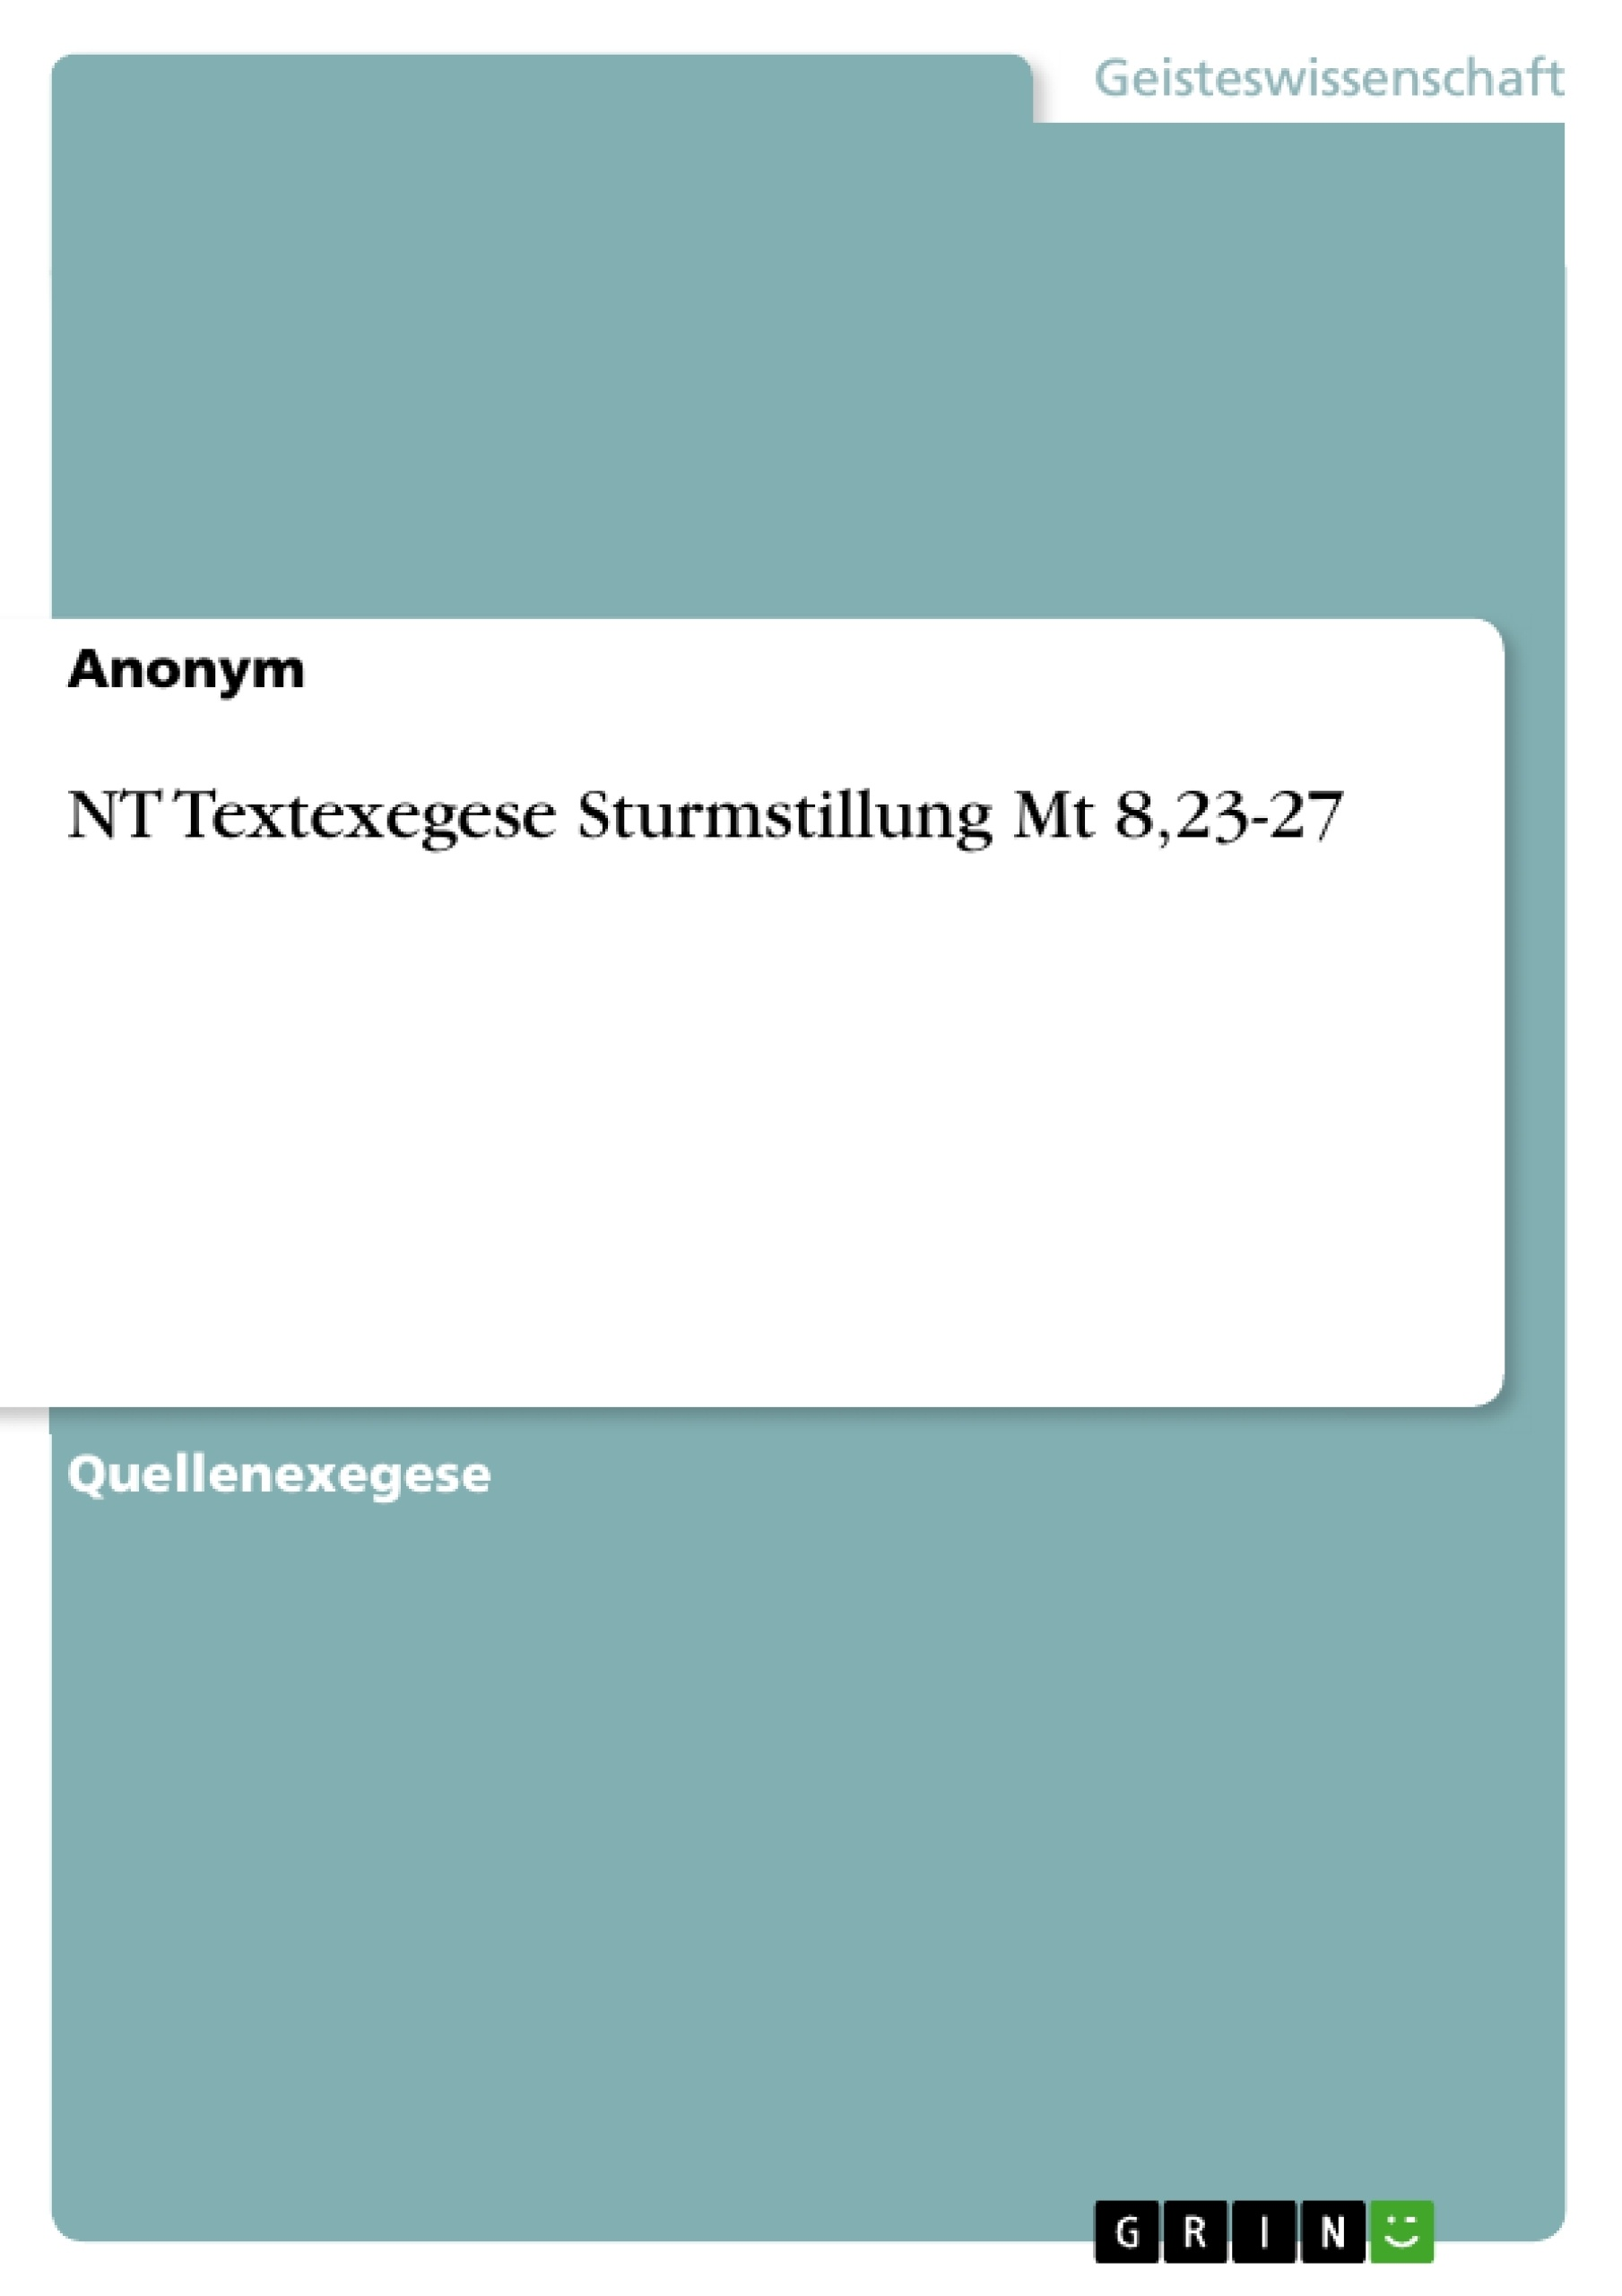 Titel: NT Textexegese Sturmstillung Mt 8,23-27